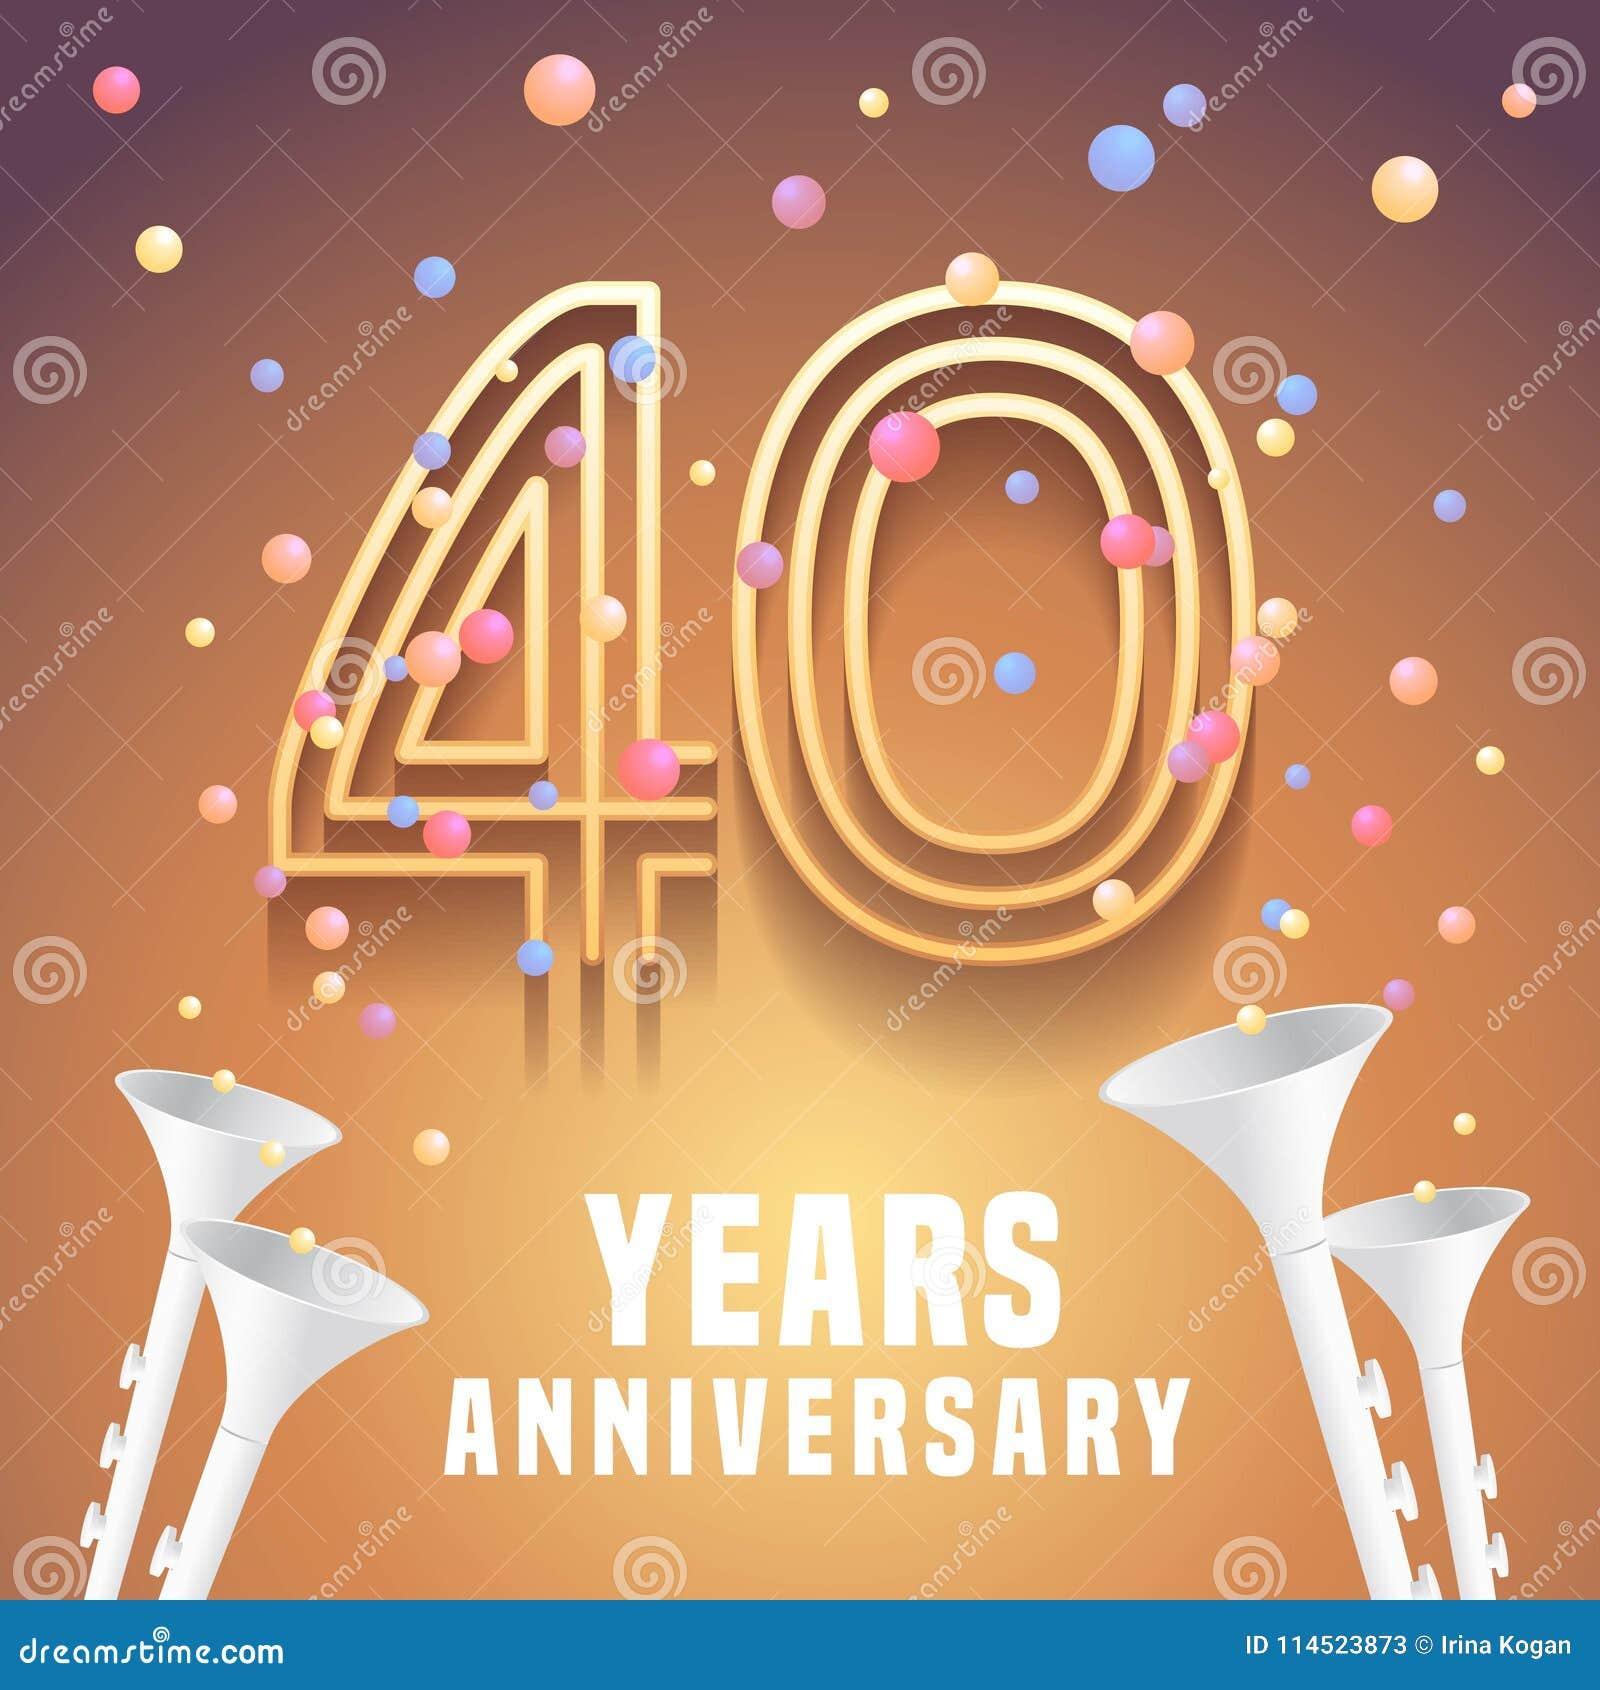 40 Years Anniversary Vector Icon Symbol Stock Vector Illustration